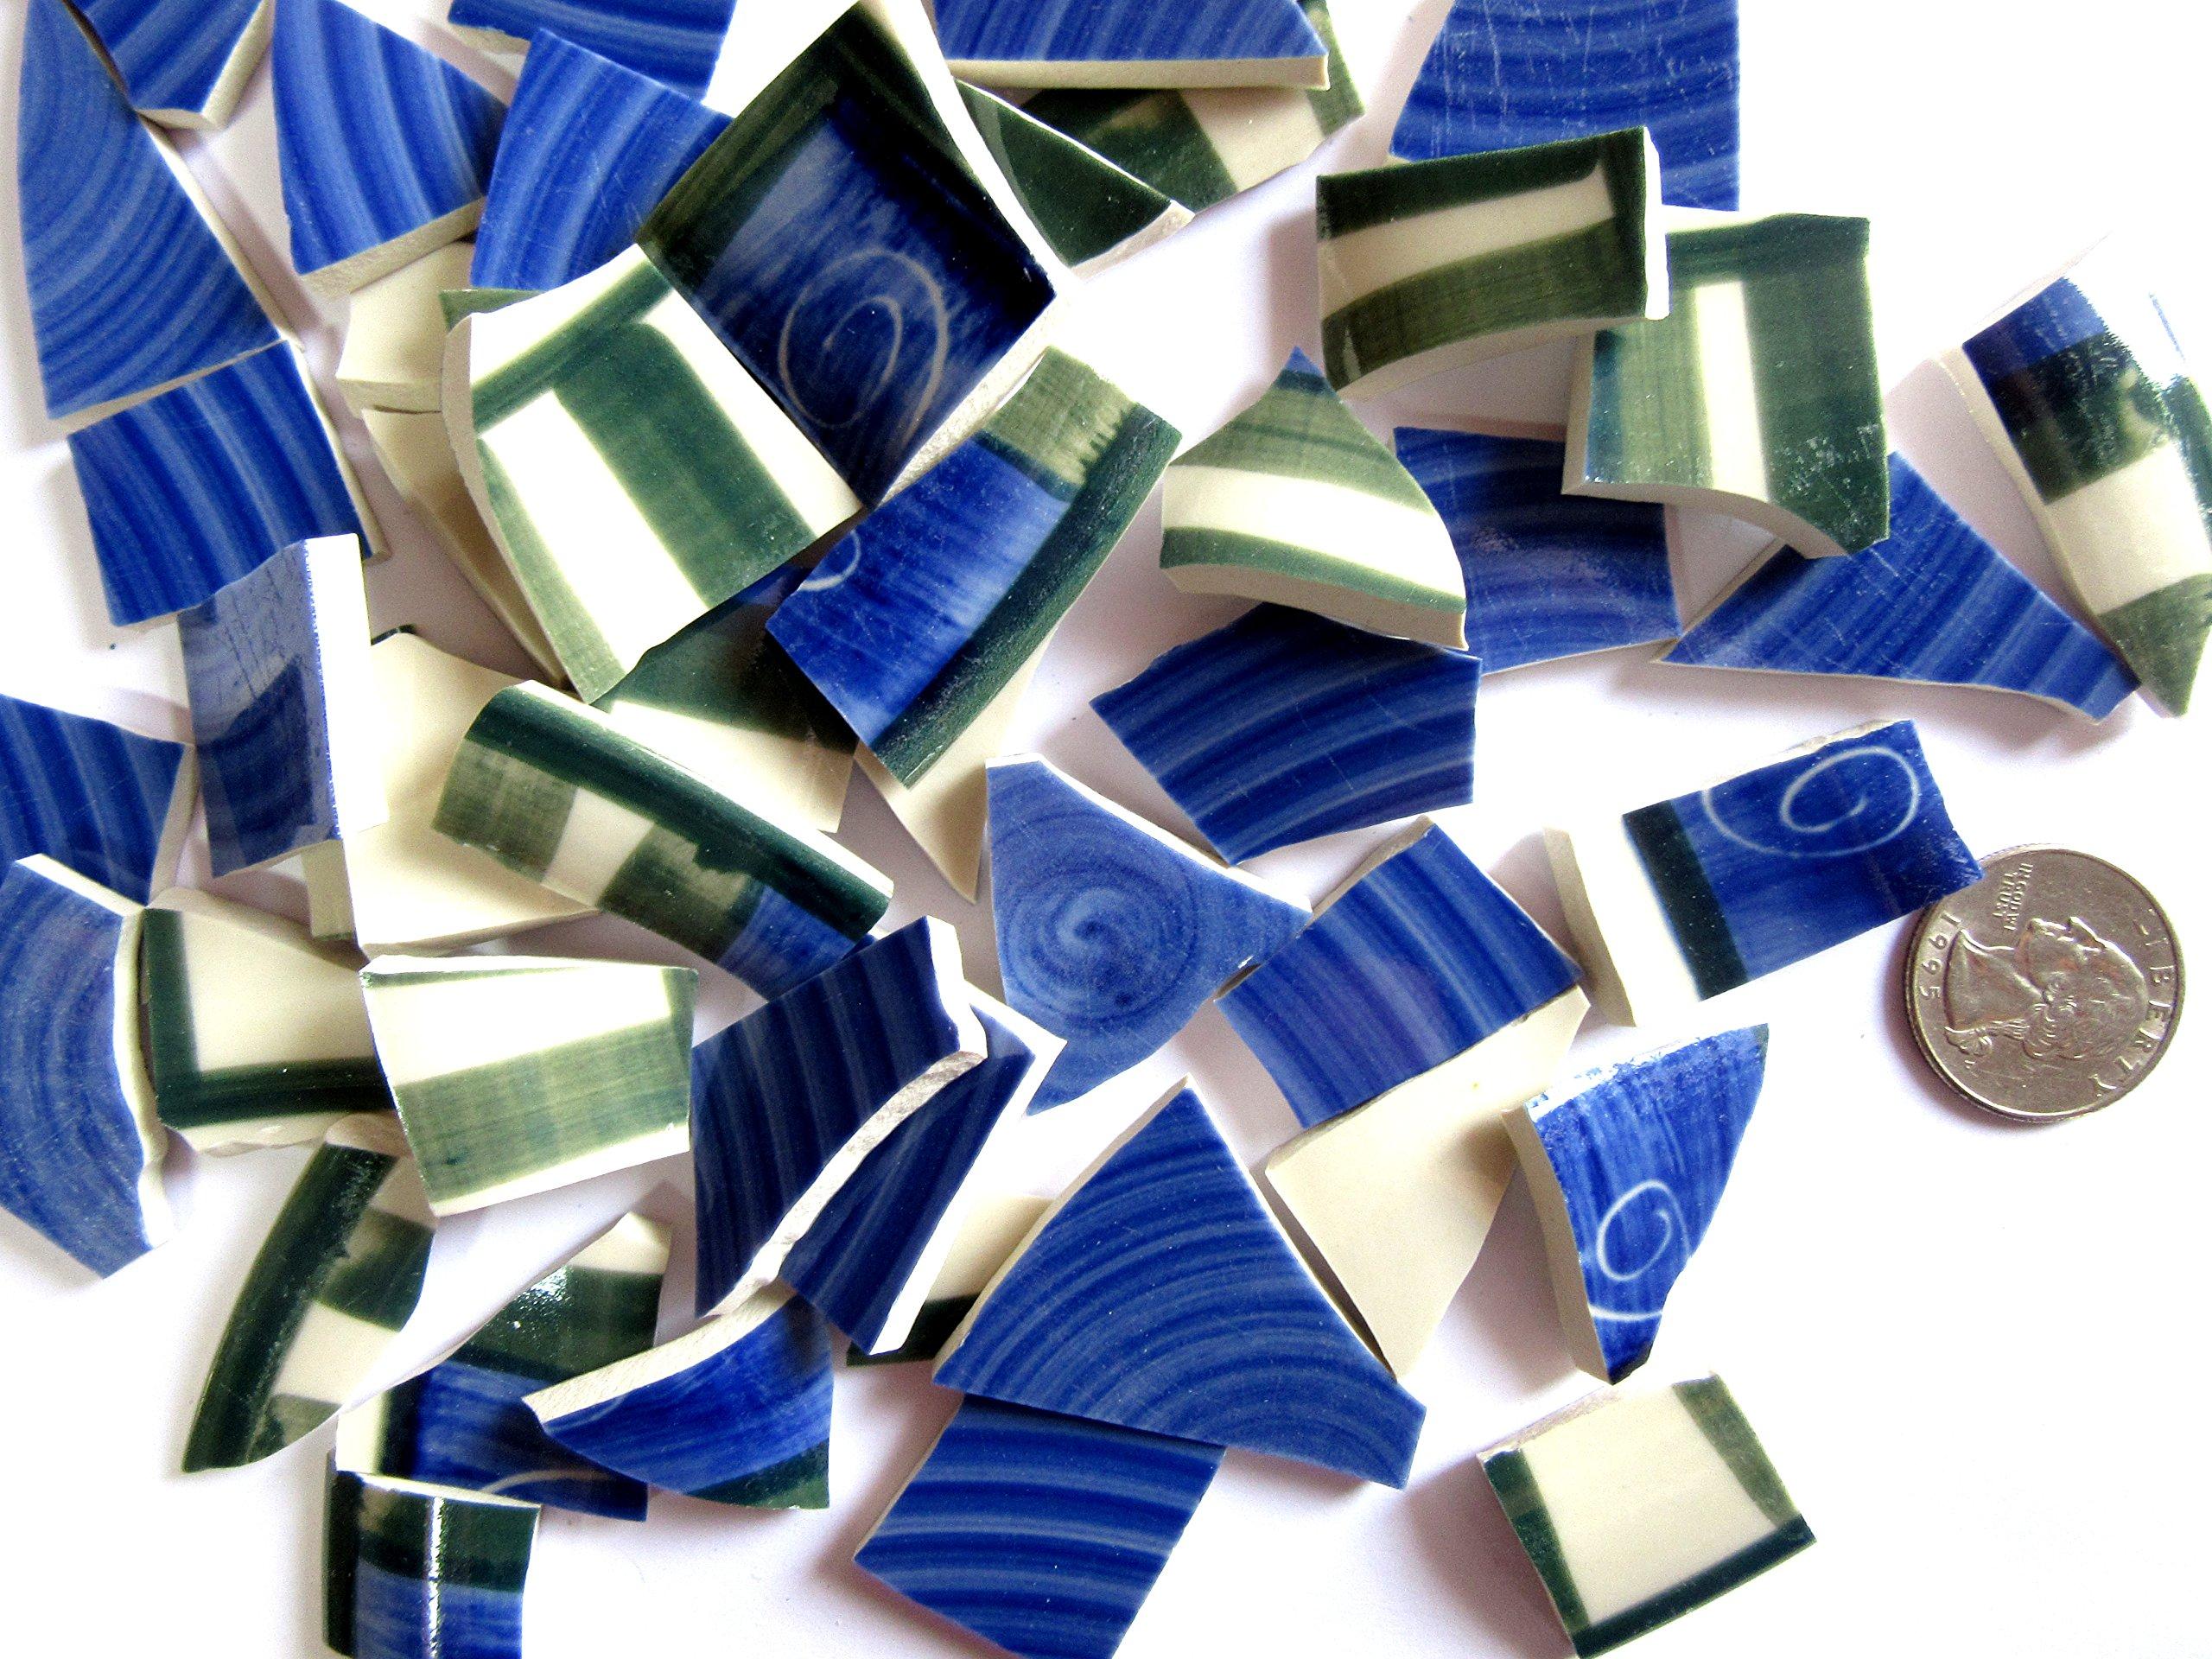 cheap craft mosaic tiles uk find craft mosaic tiles uk deals on